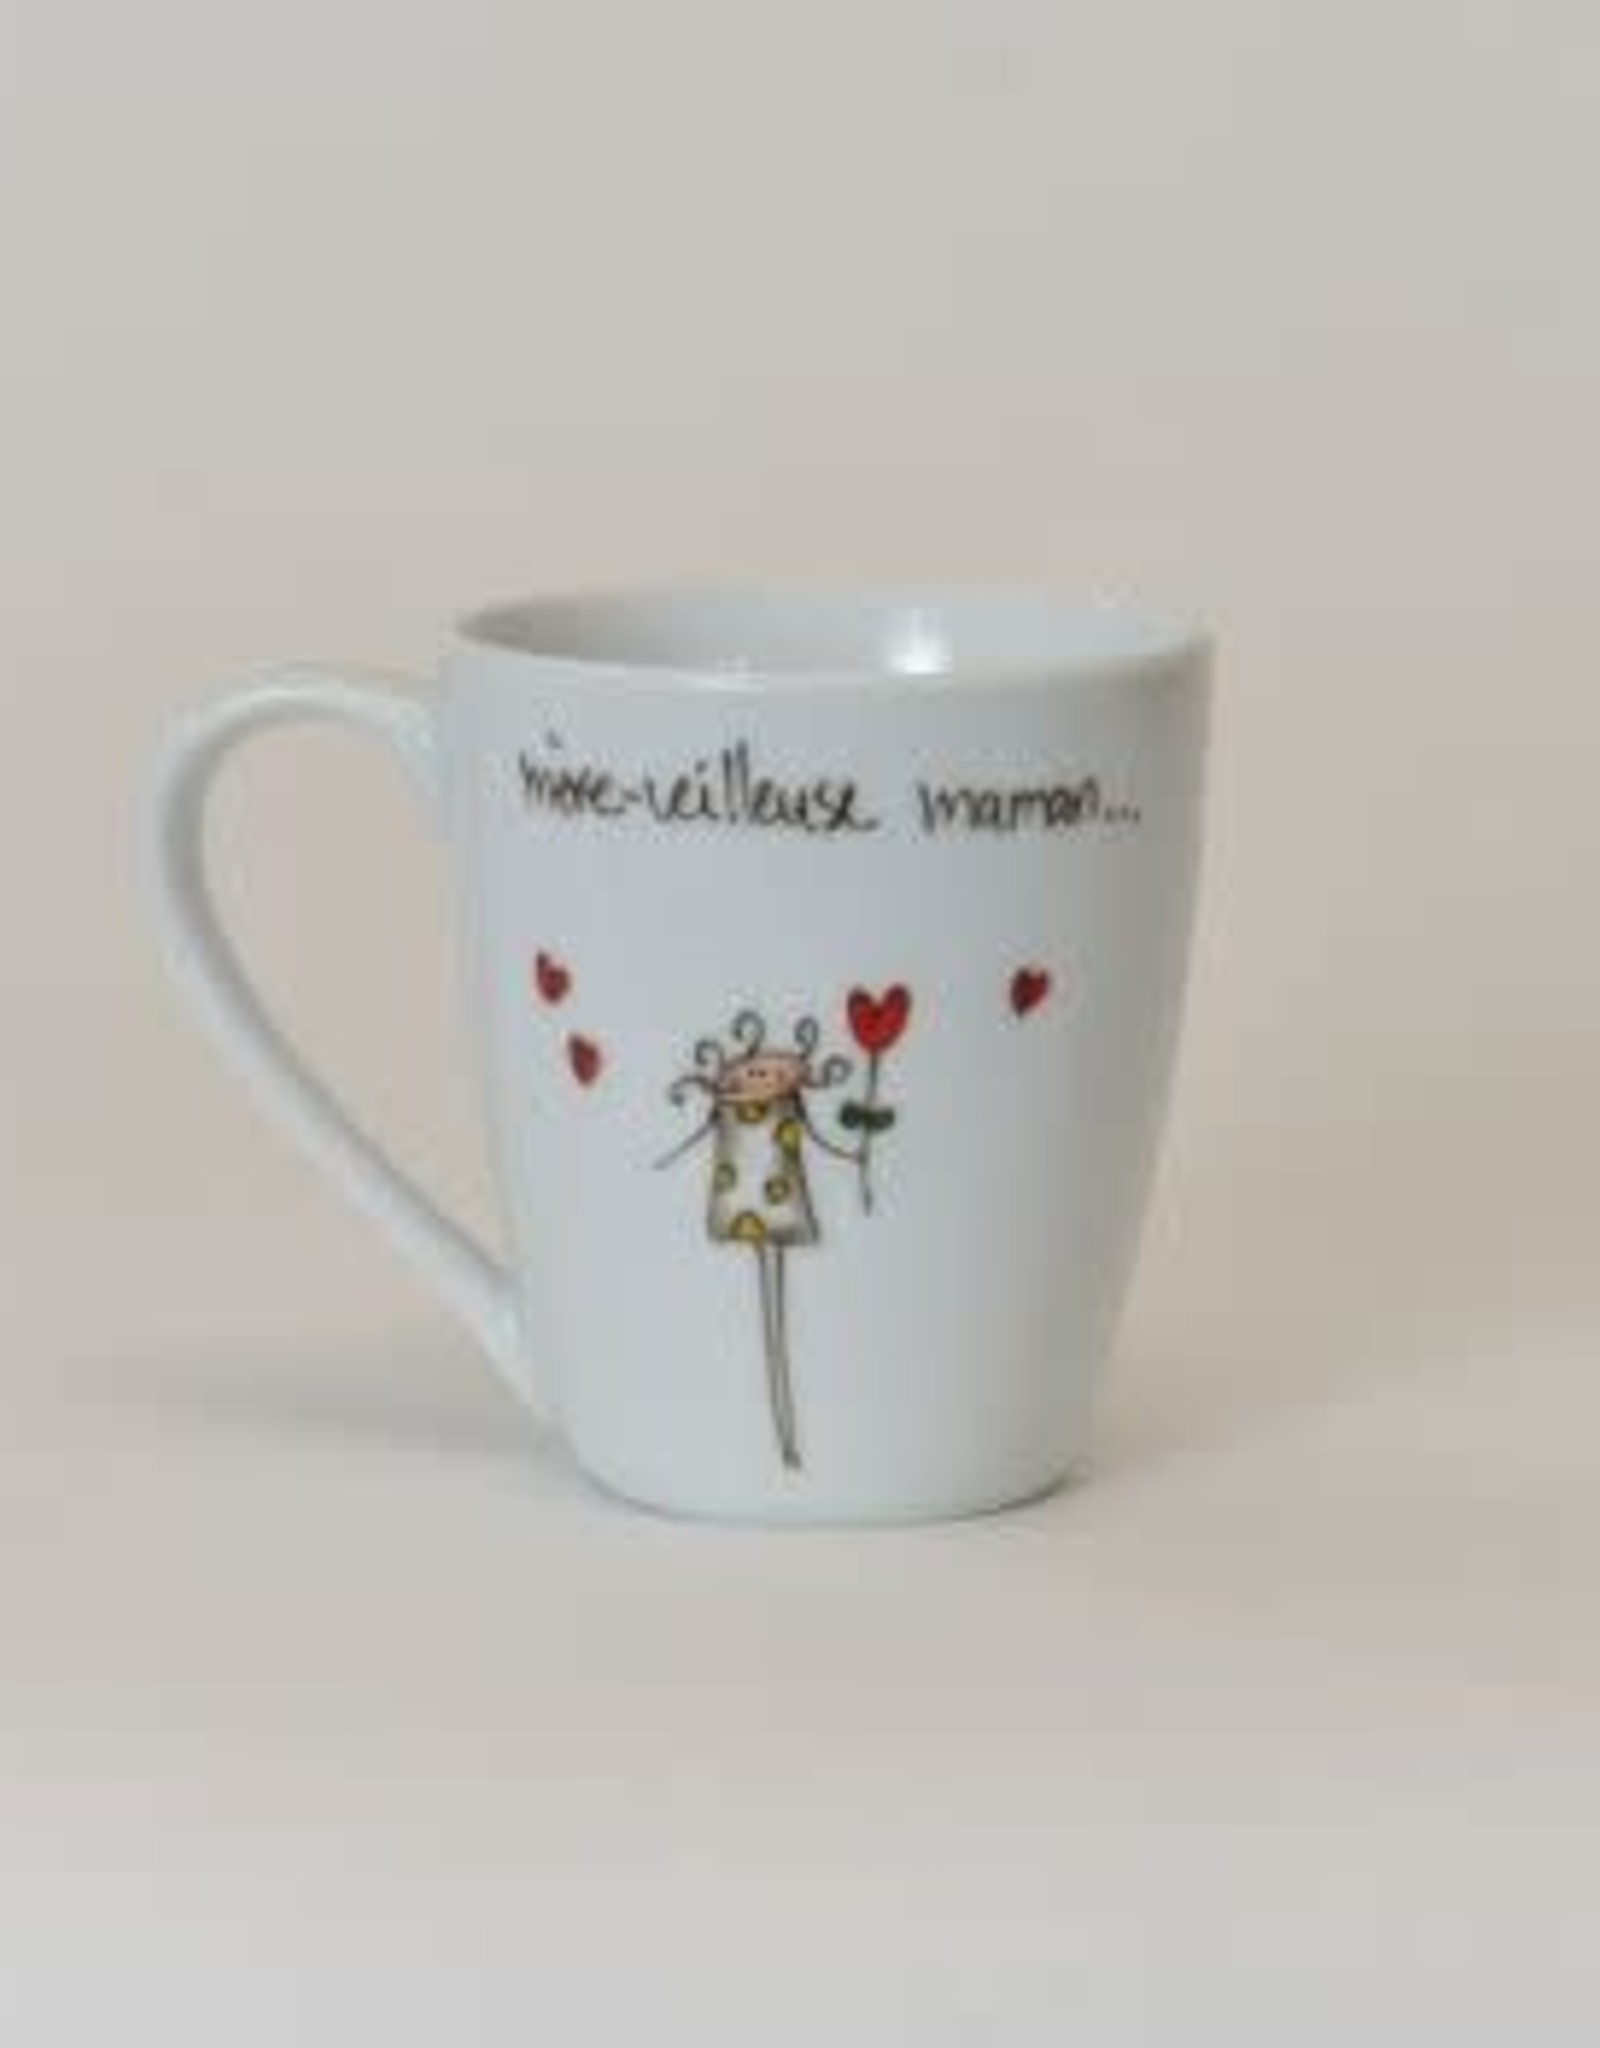 MA GRAND'NOIRE Tasse  mère-veilleuse maman